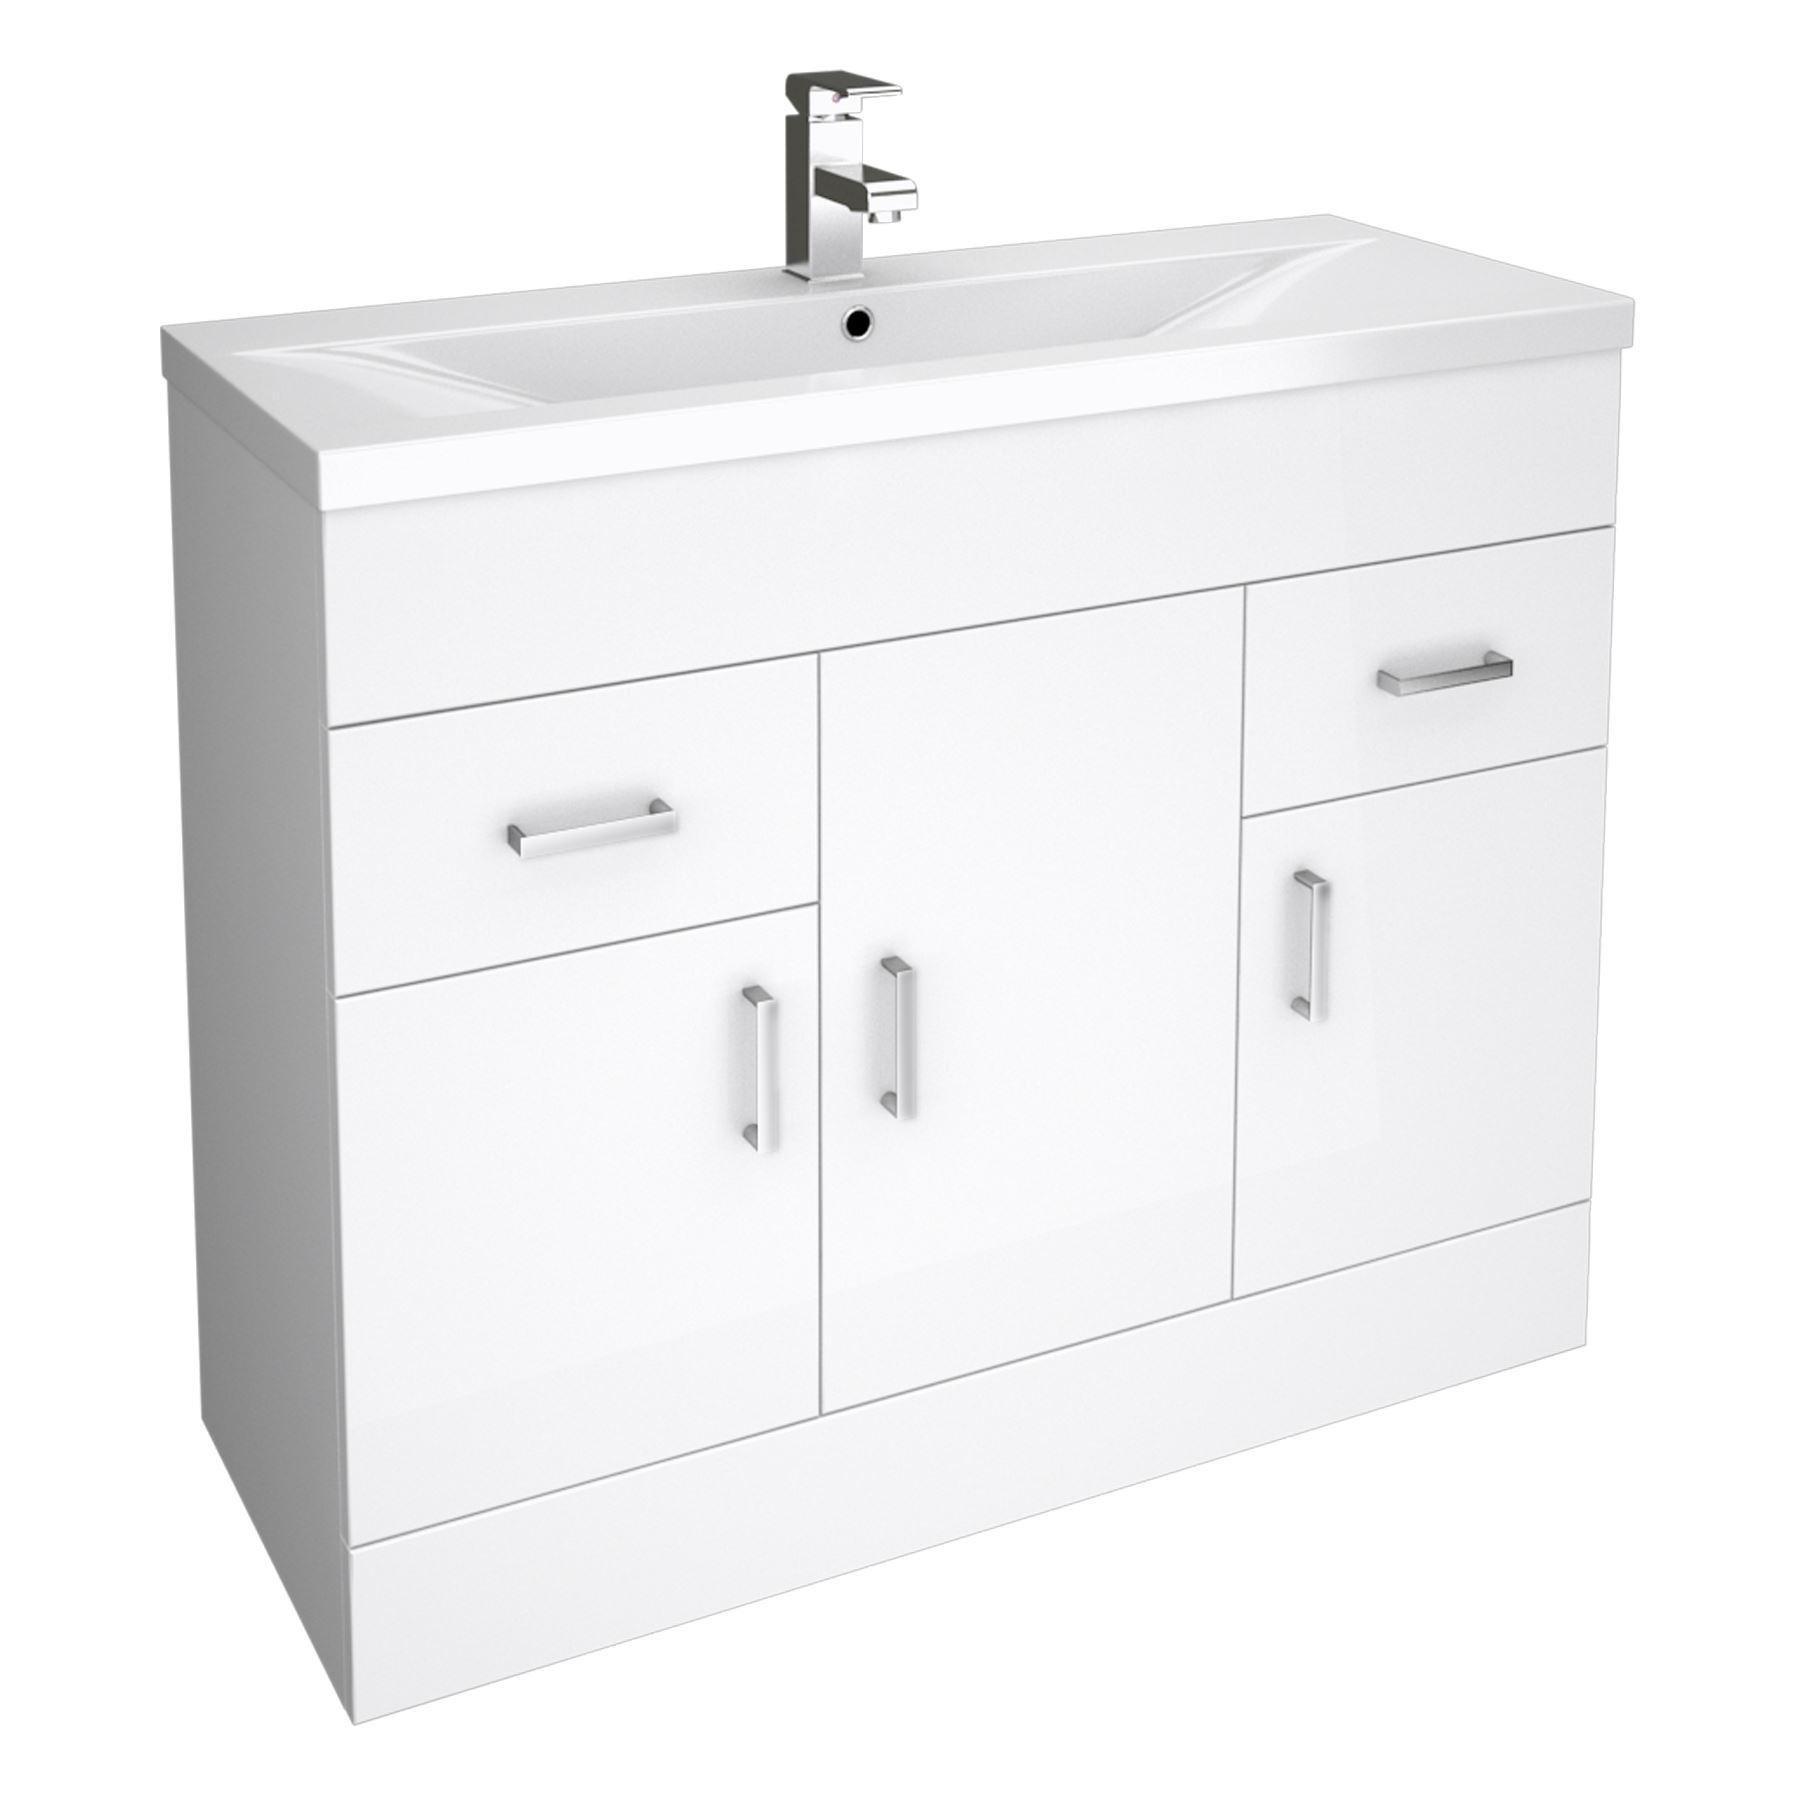 white bathroom cloakroom storage vanity unit cabinet cupboard drawer